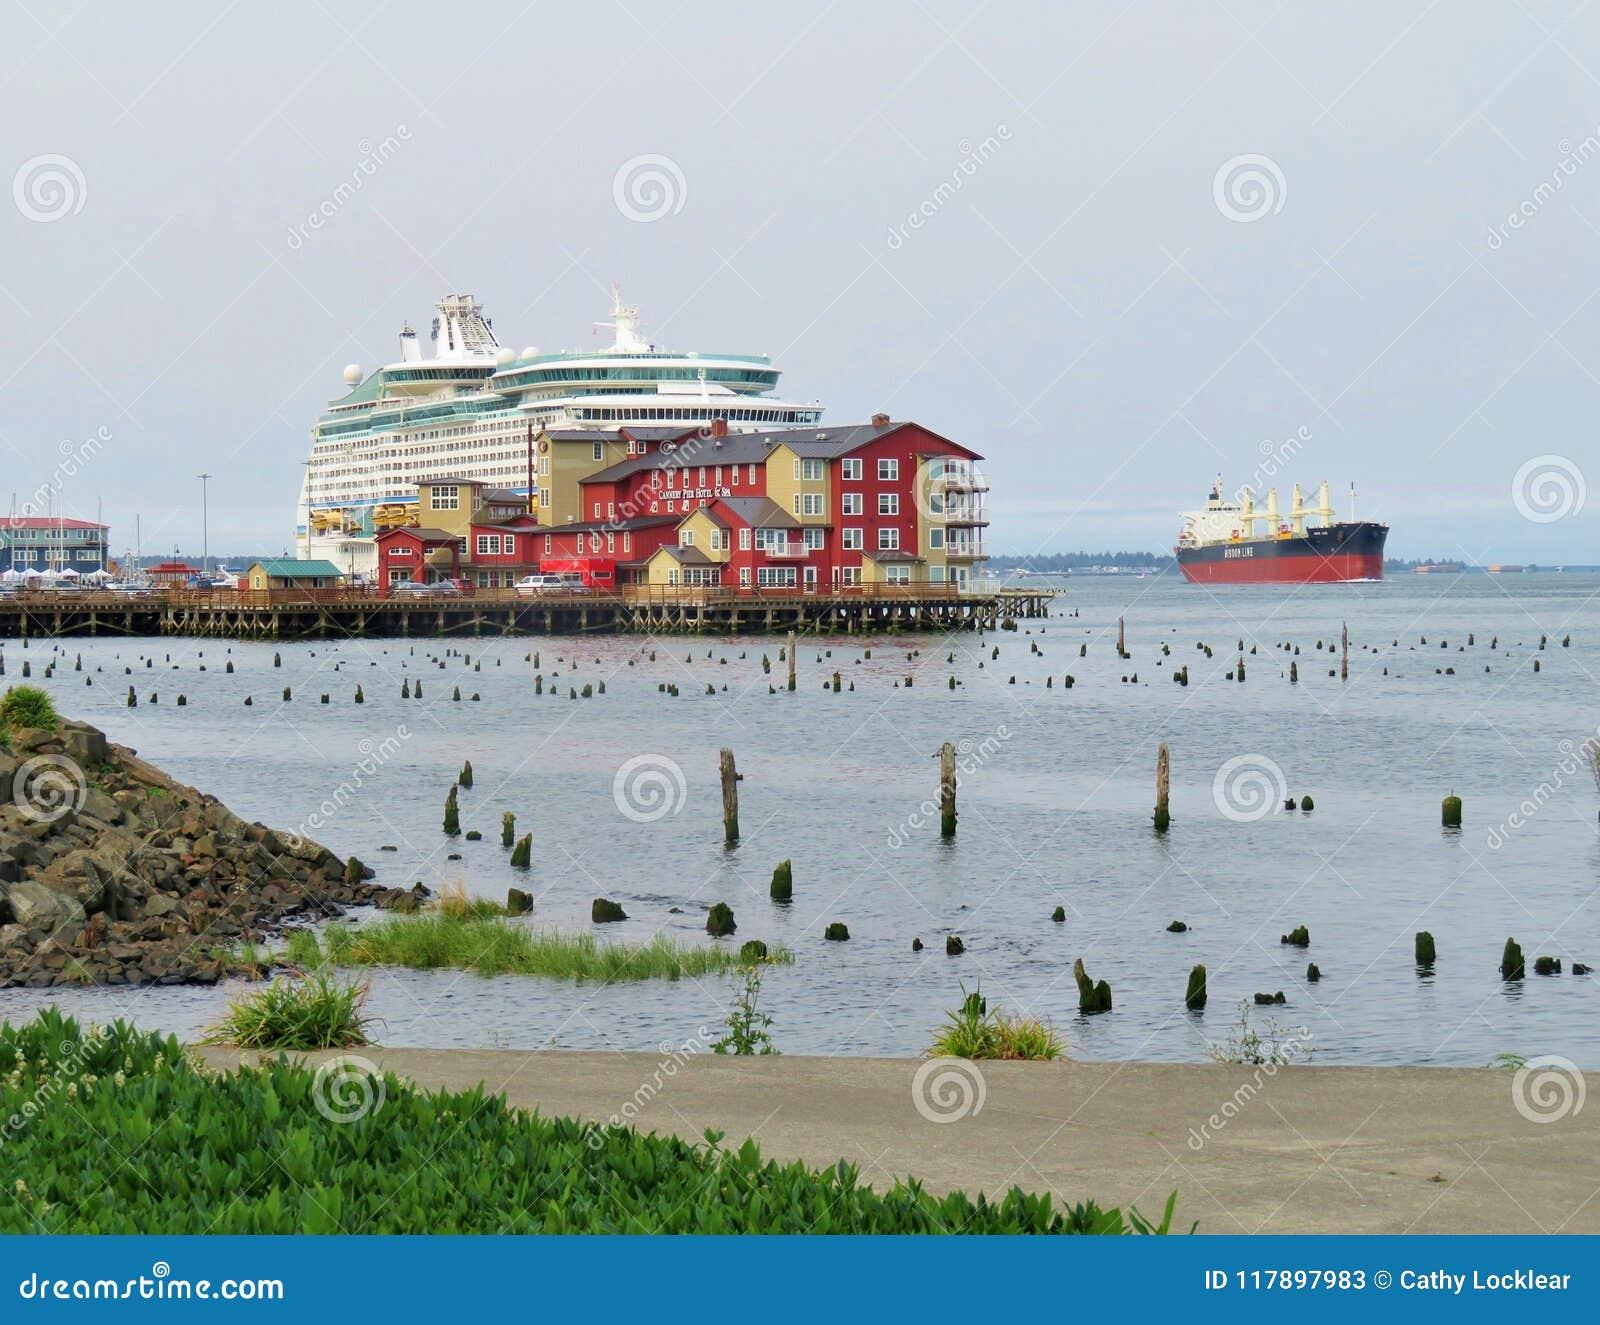 Astoria, Oregon, 9/16/2018, Royal Caribbean`s Explorer of the Seas cruise ship docked along side the Cannery Pier Hotel & Spa